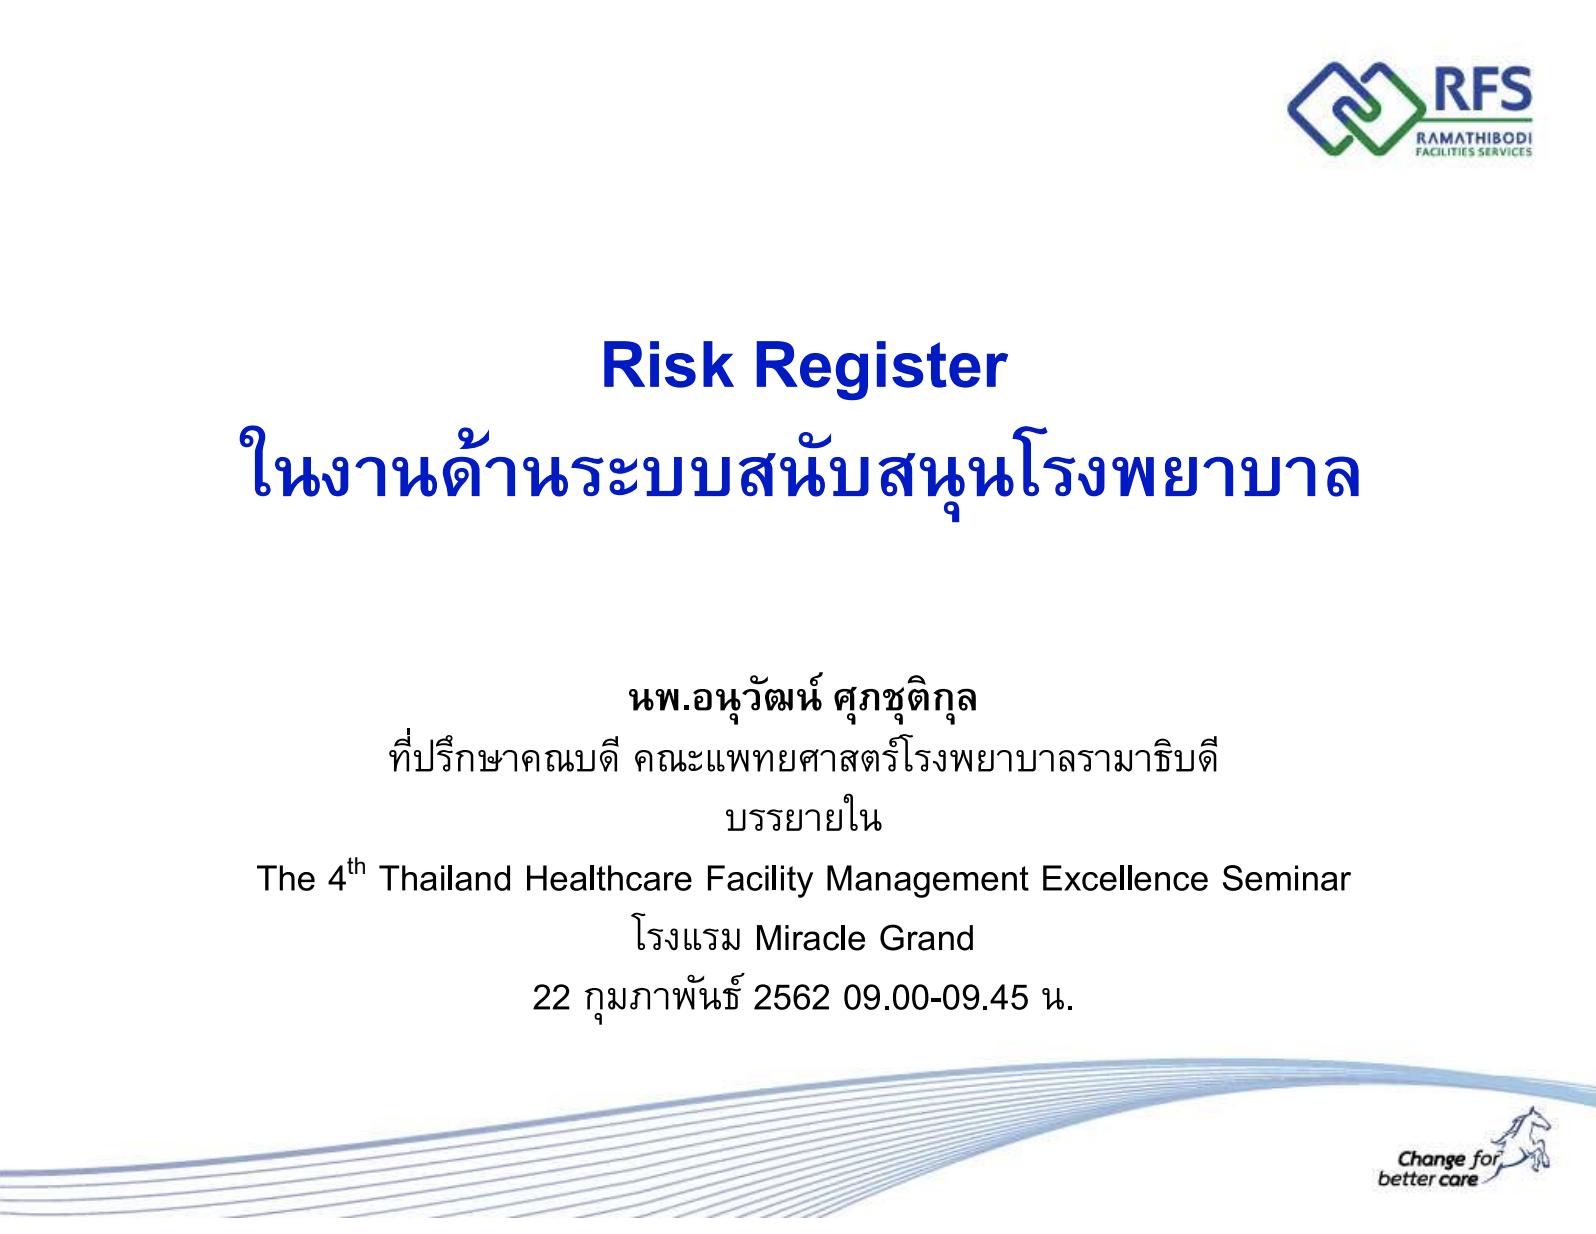 Risk Register ในงานด้านระบบสนับสนุนโรงพบาบาล